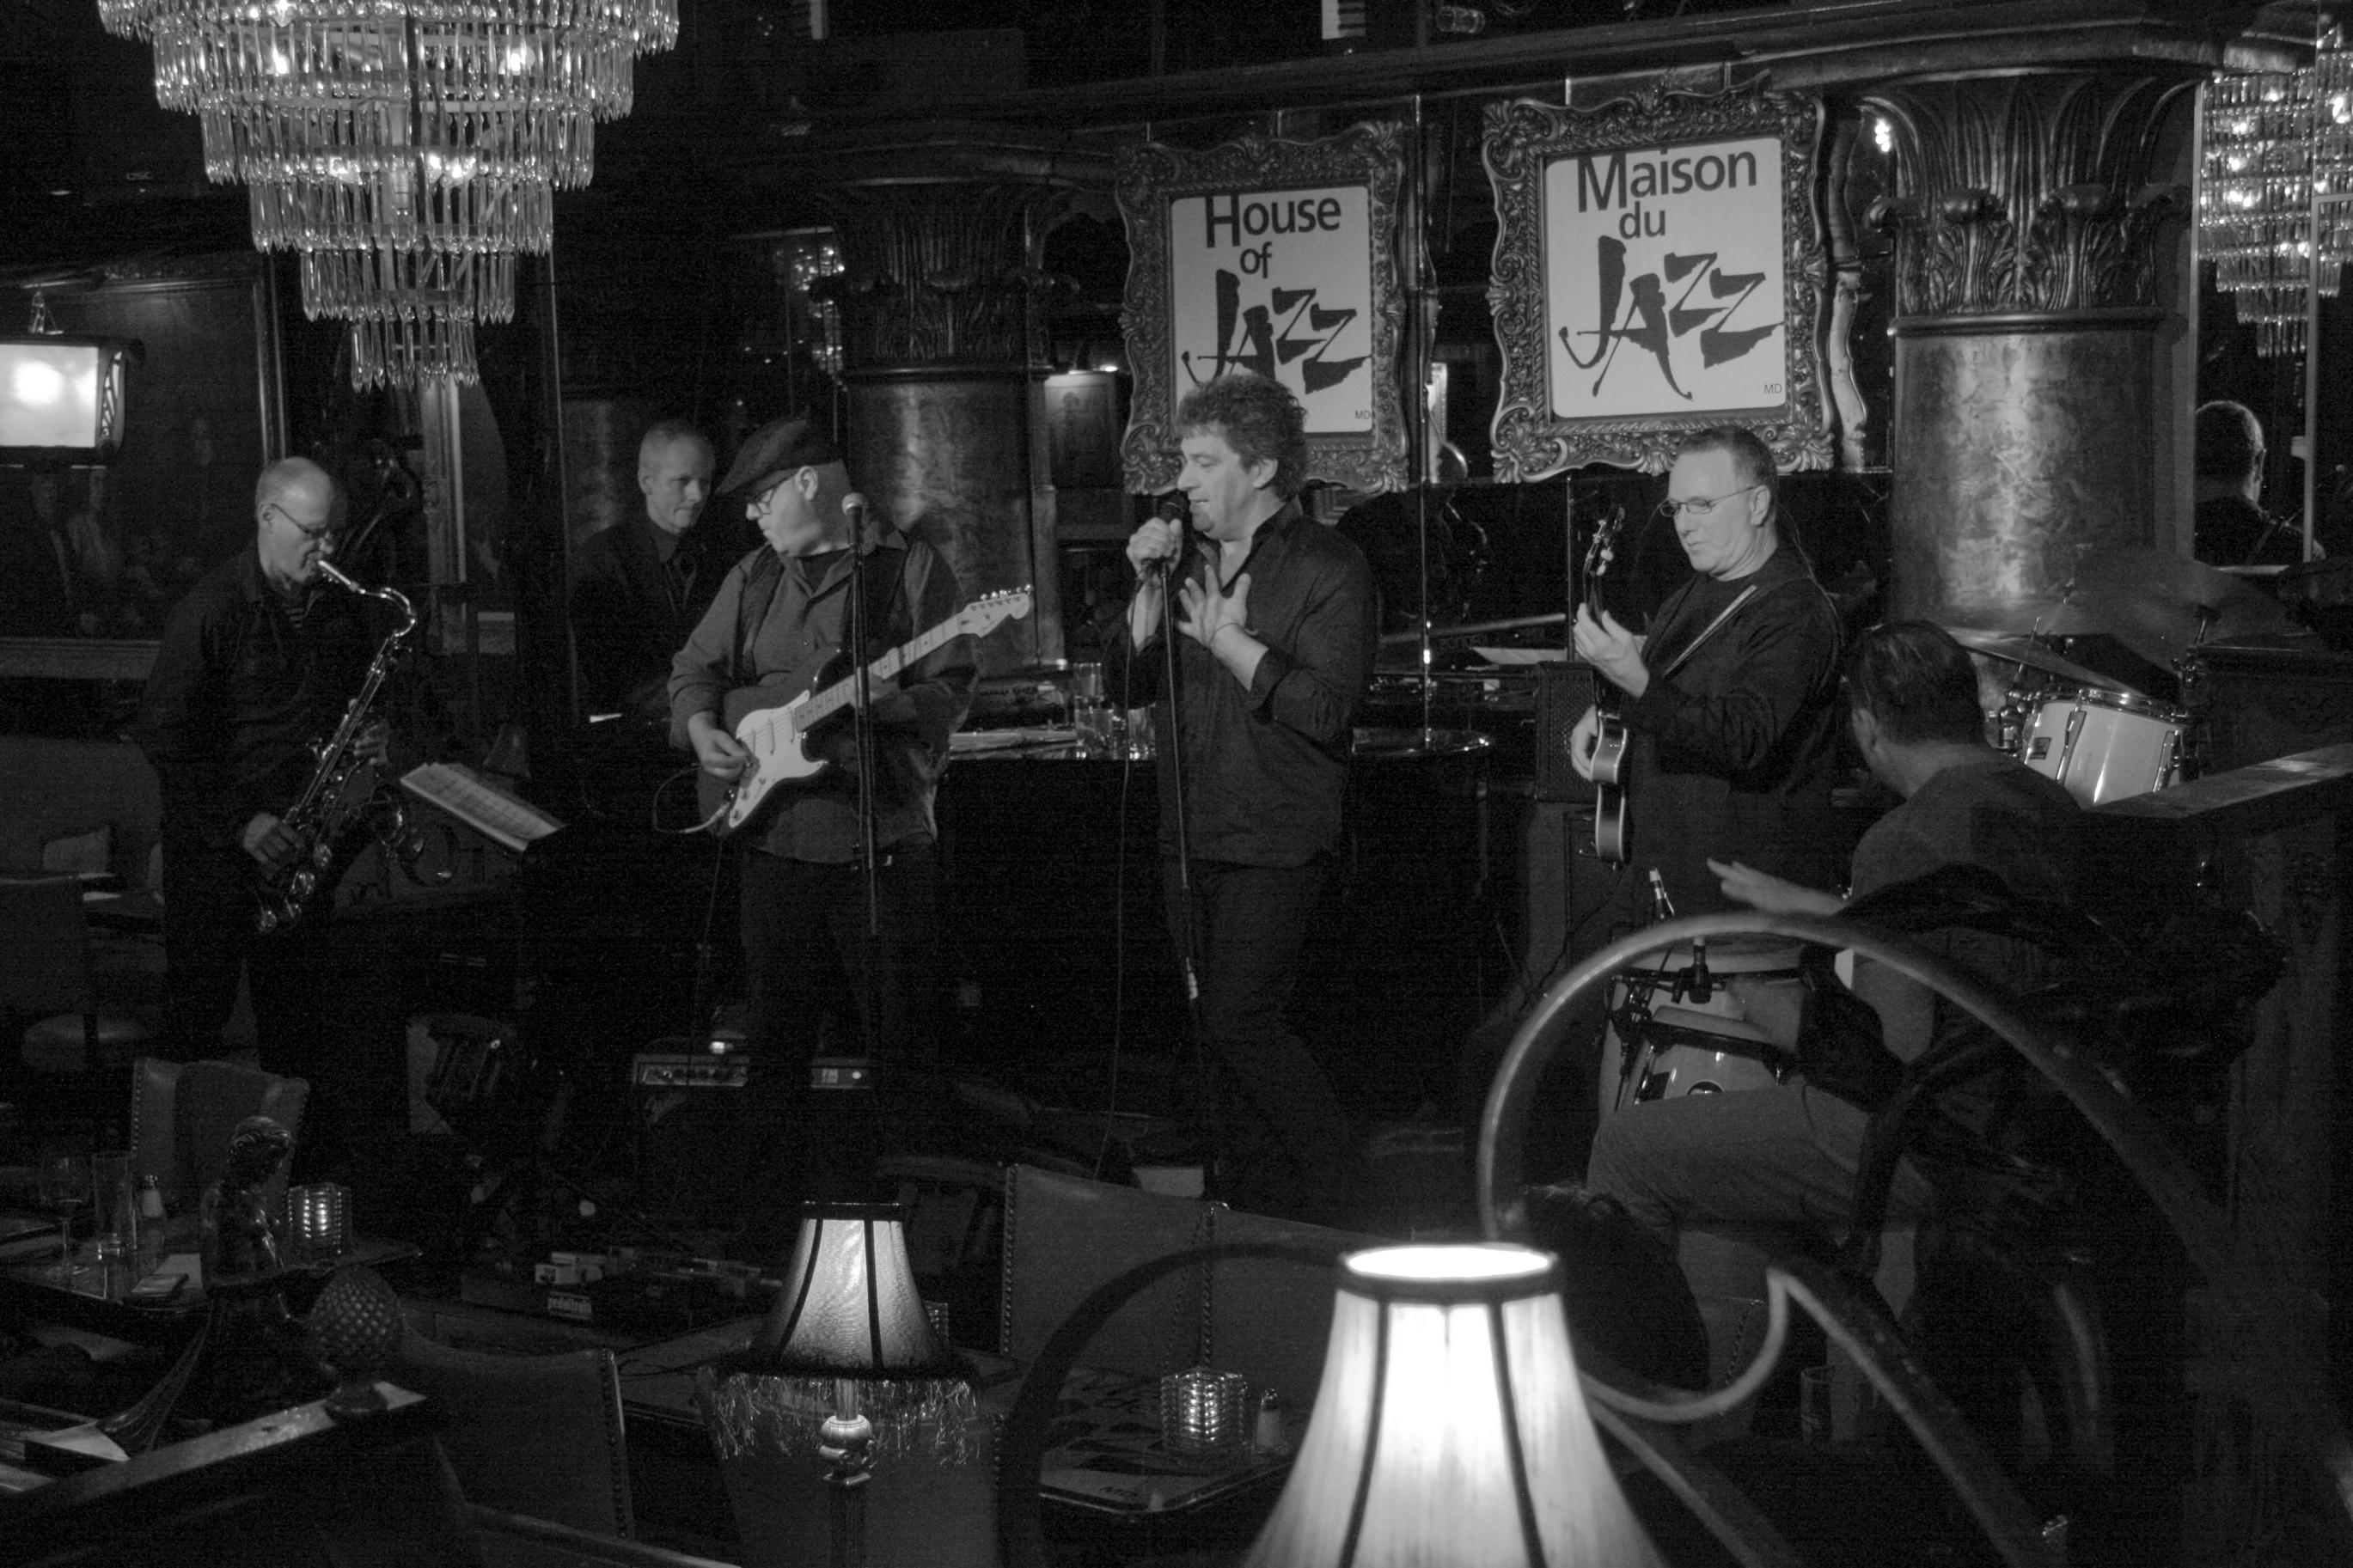 House of Jazz_Black and white-4604.jpg